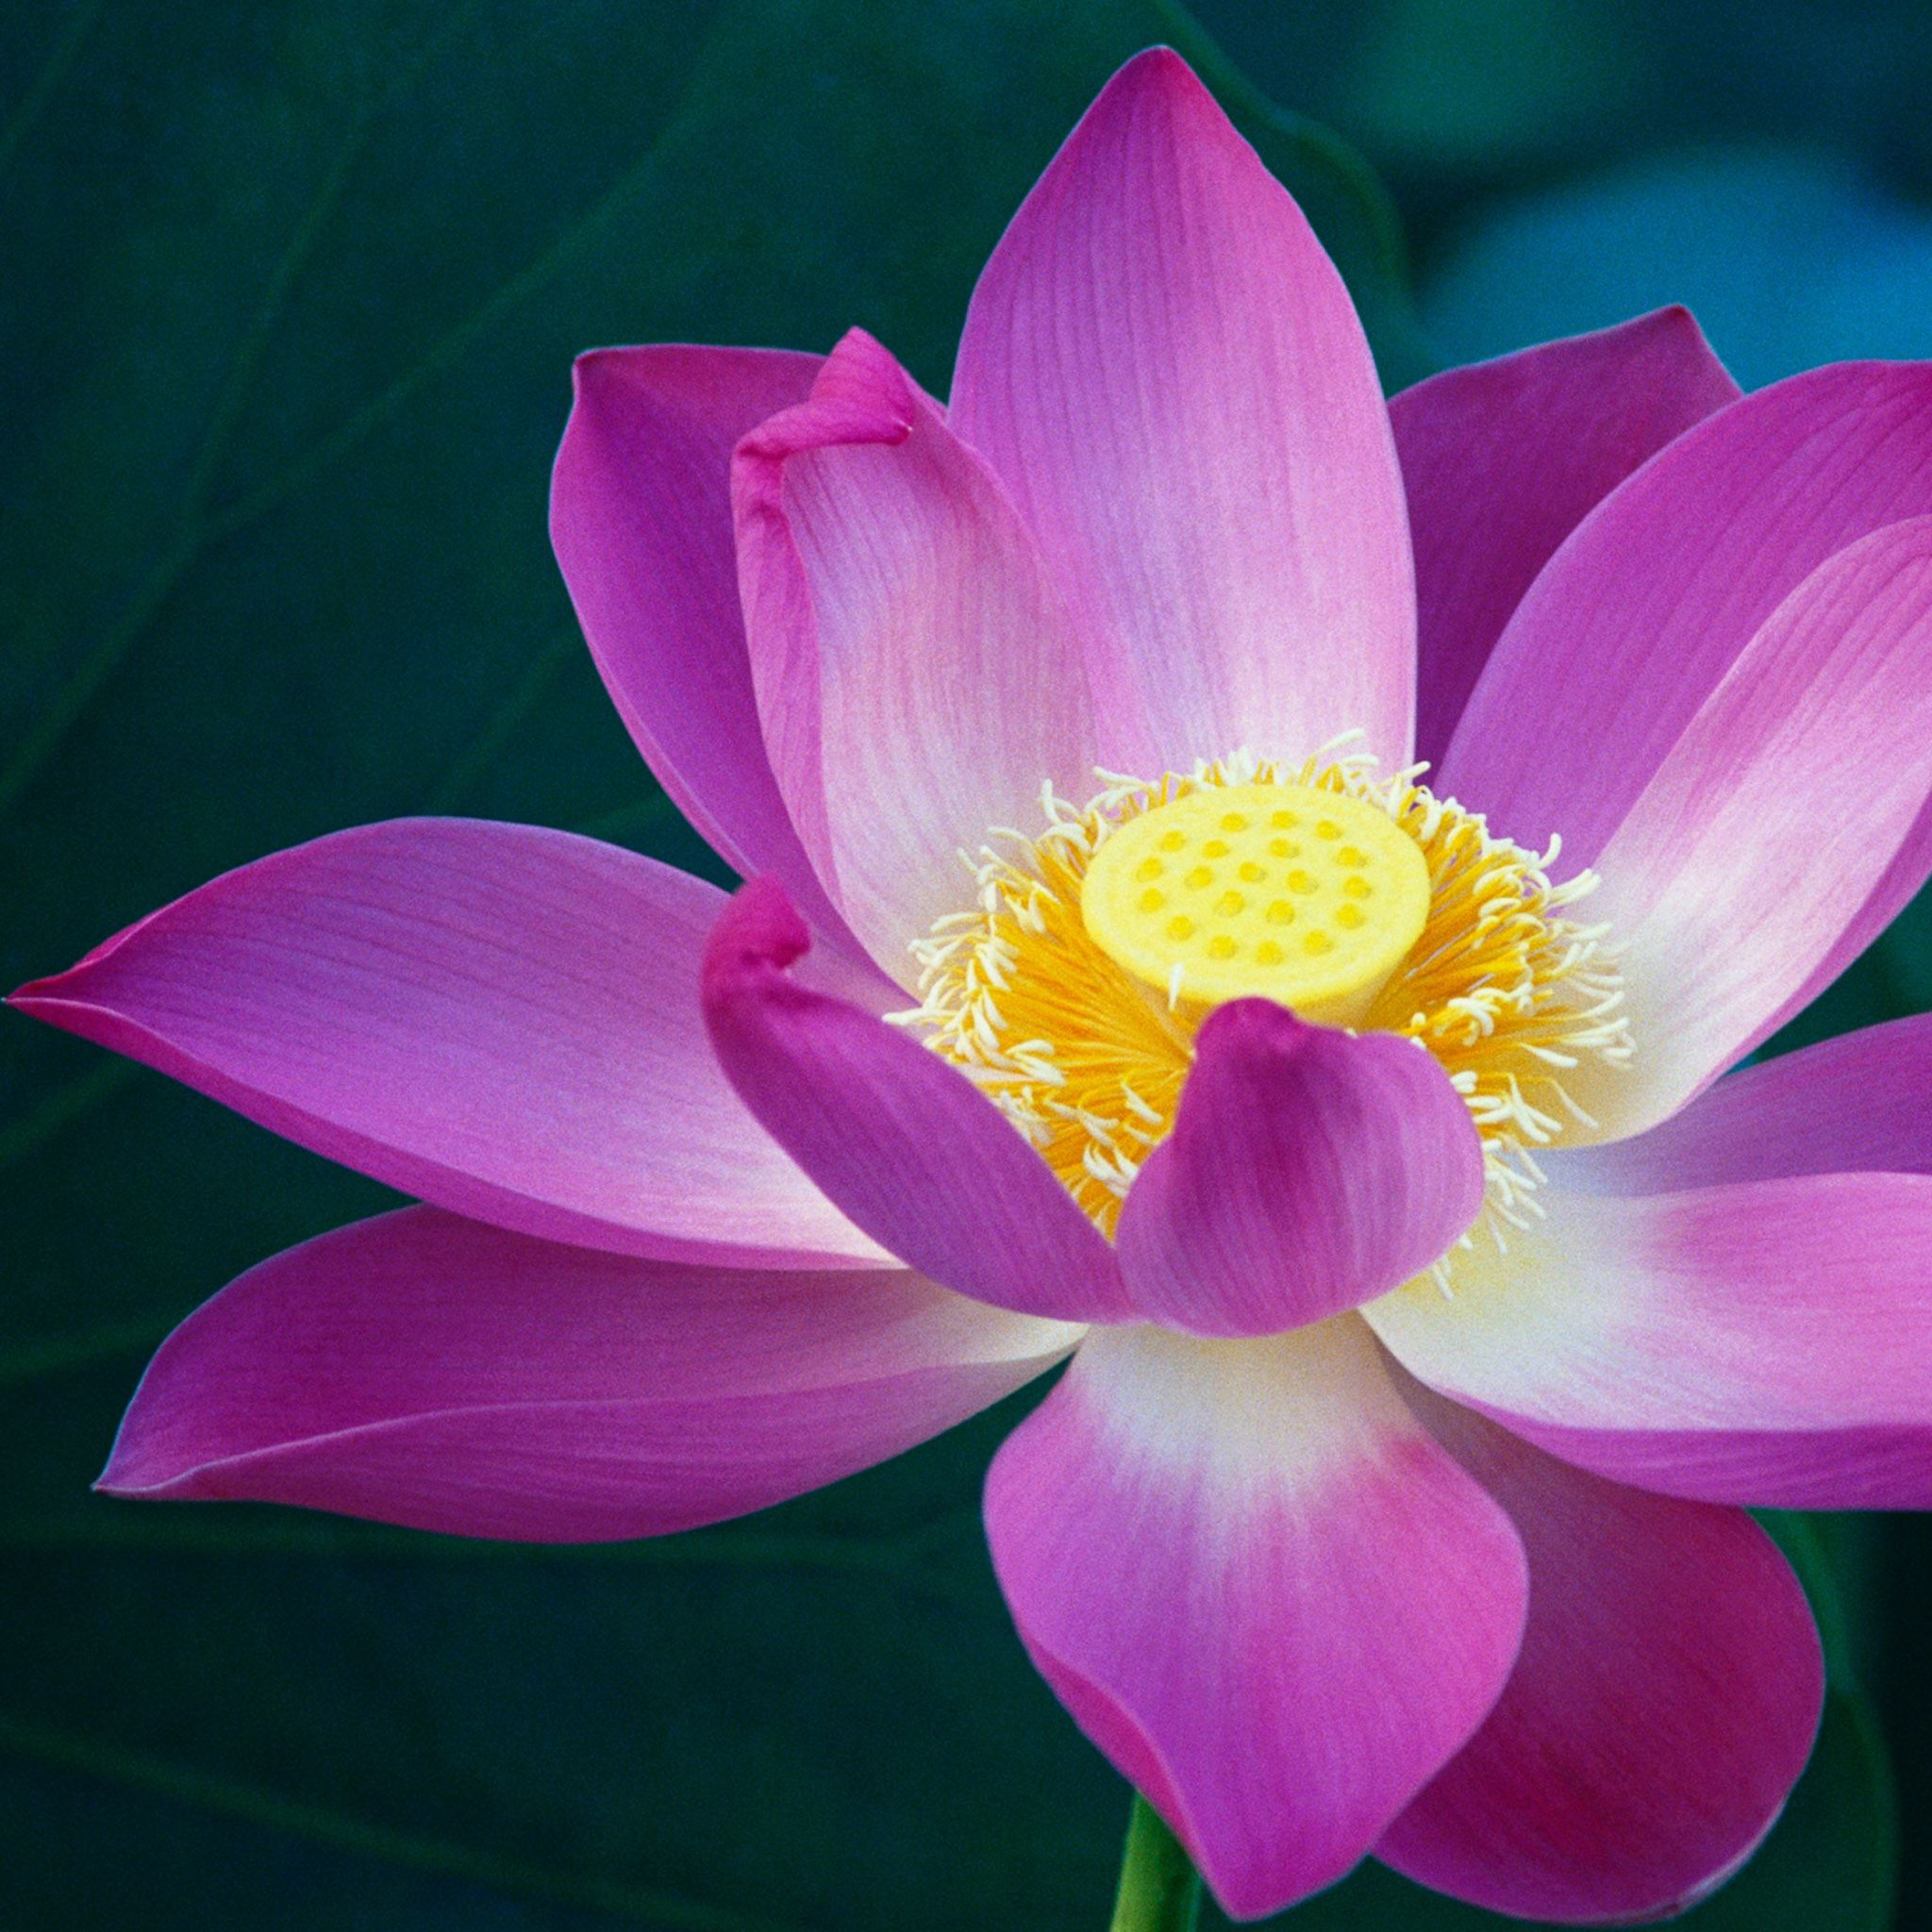 Lotus Flower Ipad Air Wallpaper Download Iphone Wallpapers Ipad